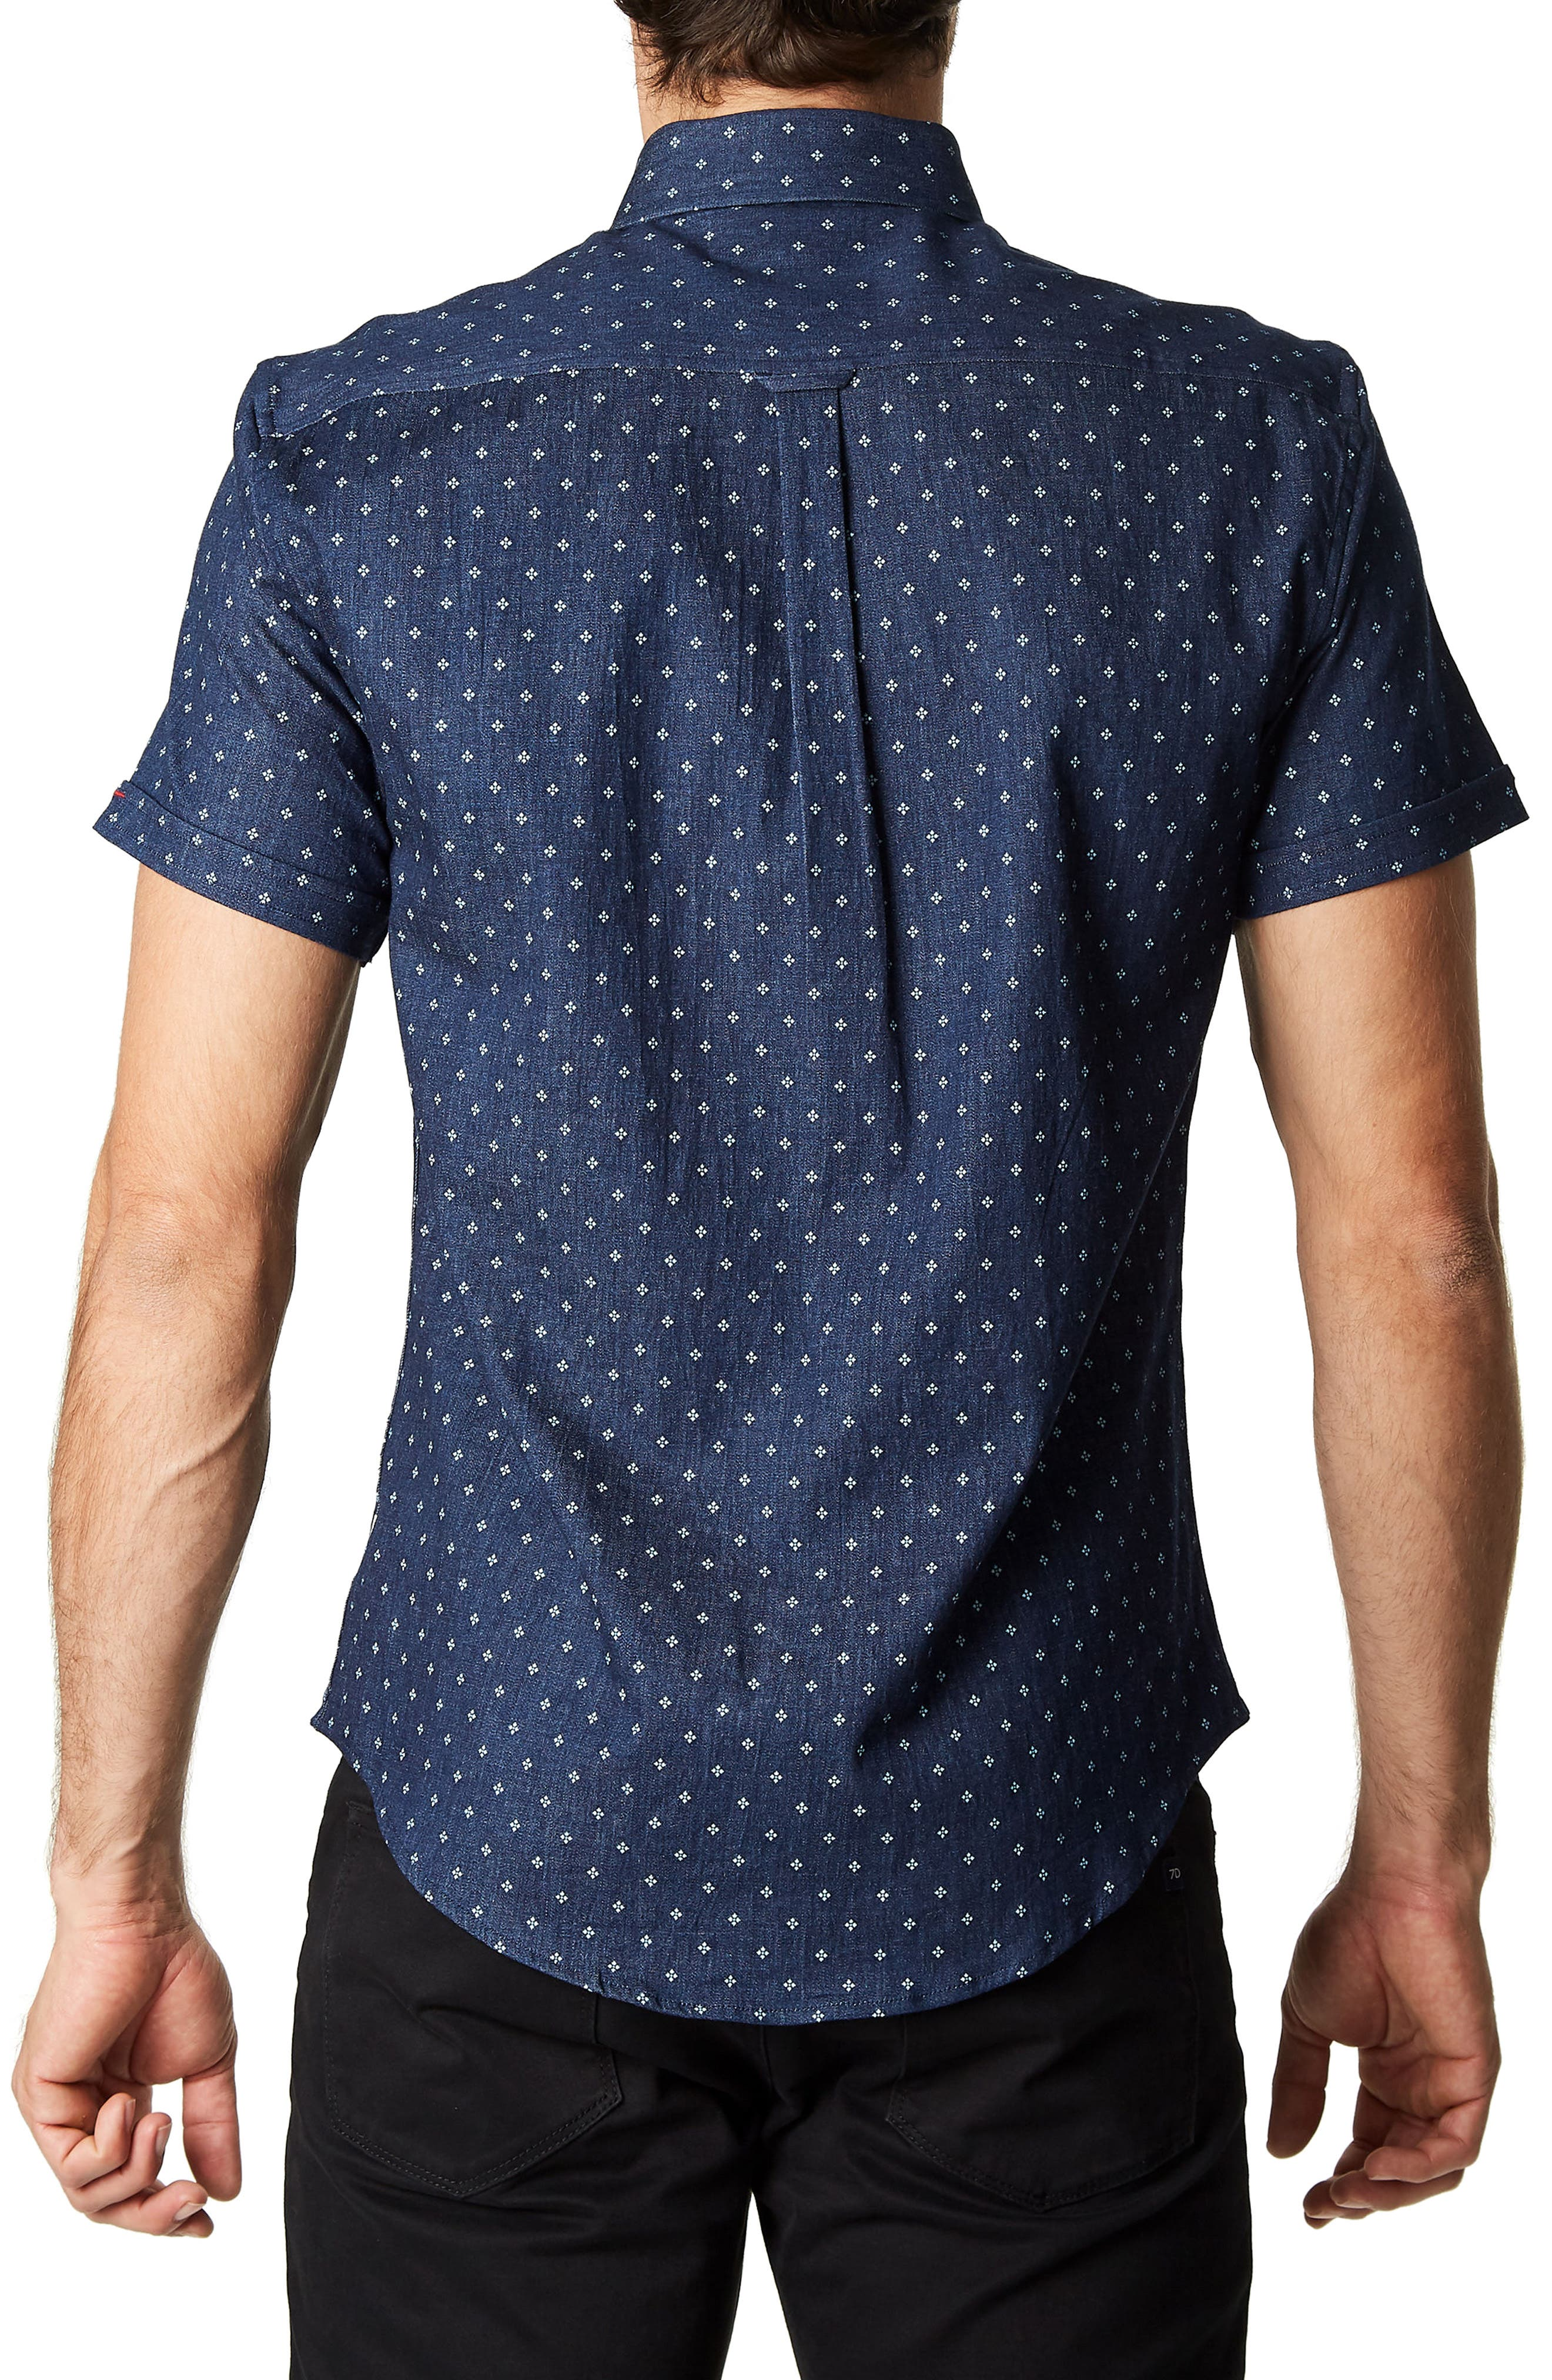 Best of Times Trim Fit Short Sleeve Sport Shirt,                             Alternate thumbnail 2, color,                             Navy